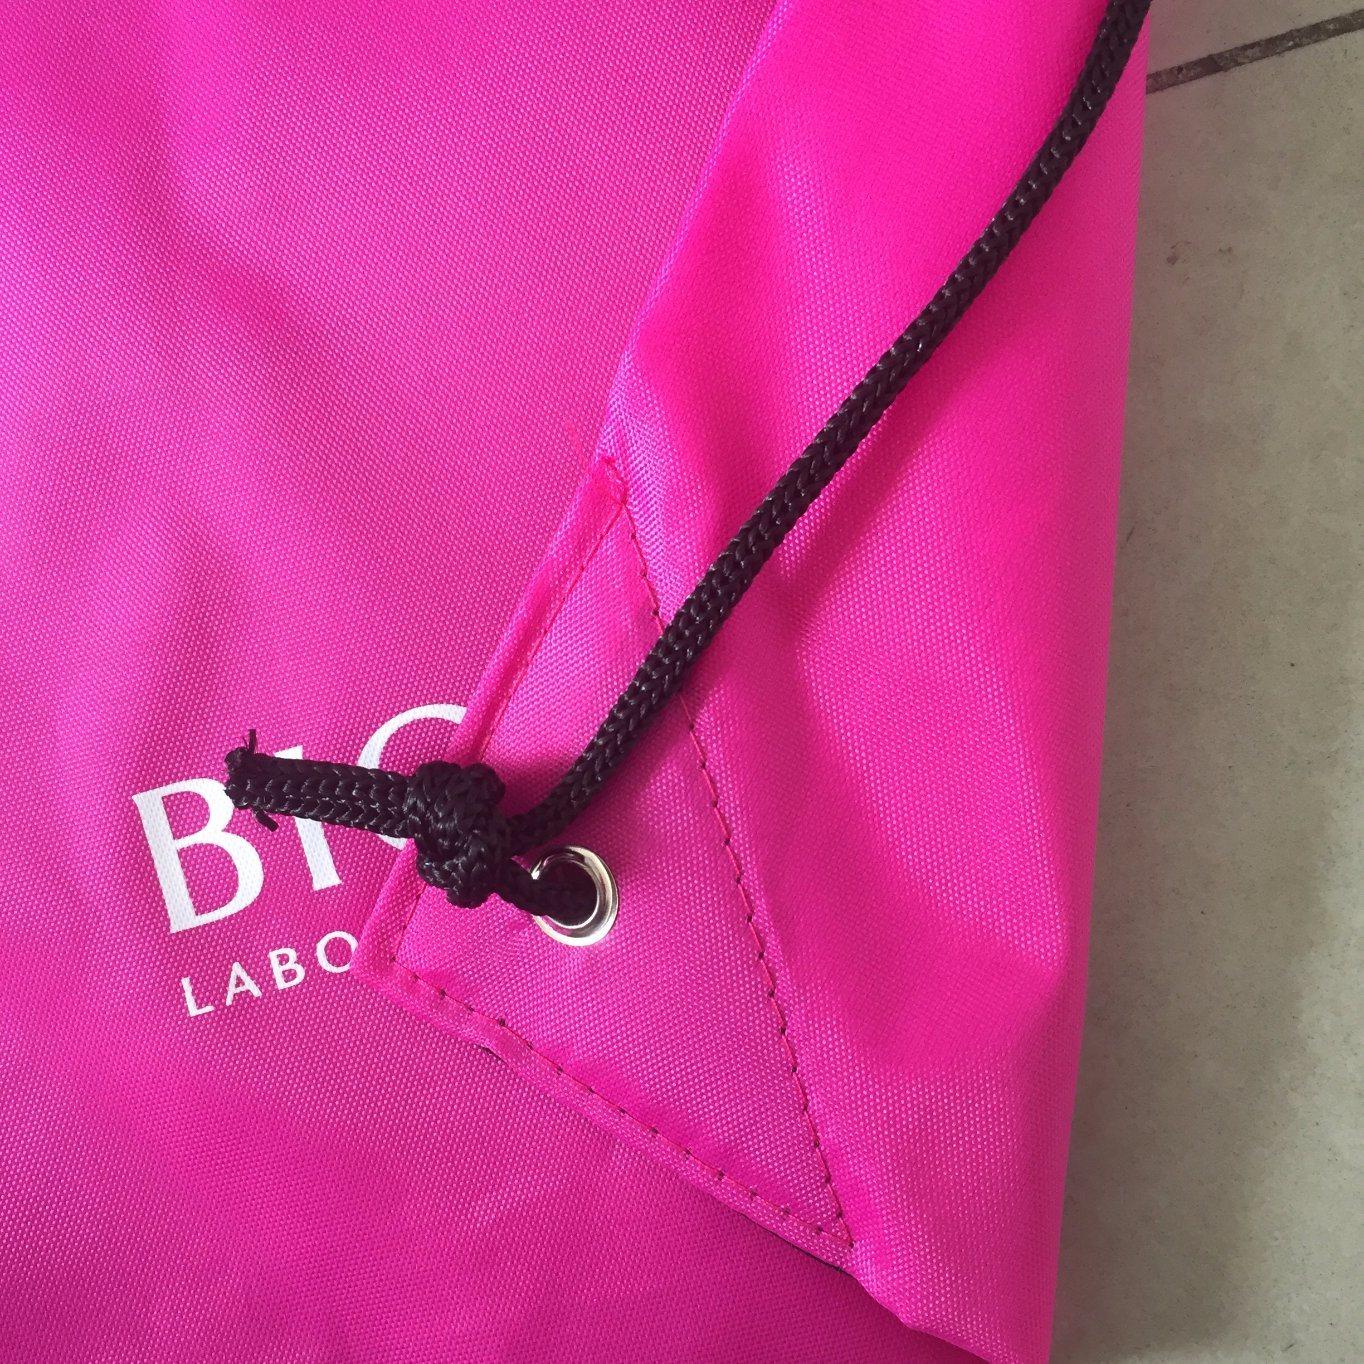 Custom Design Gym Sports Backpack Bag with Drawstring